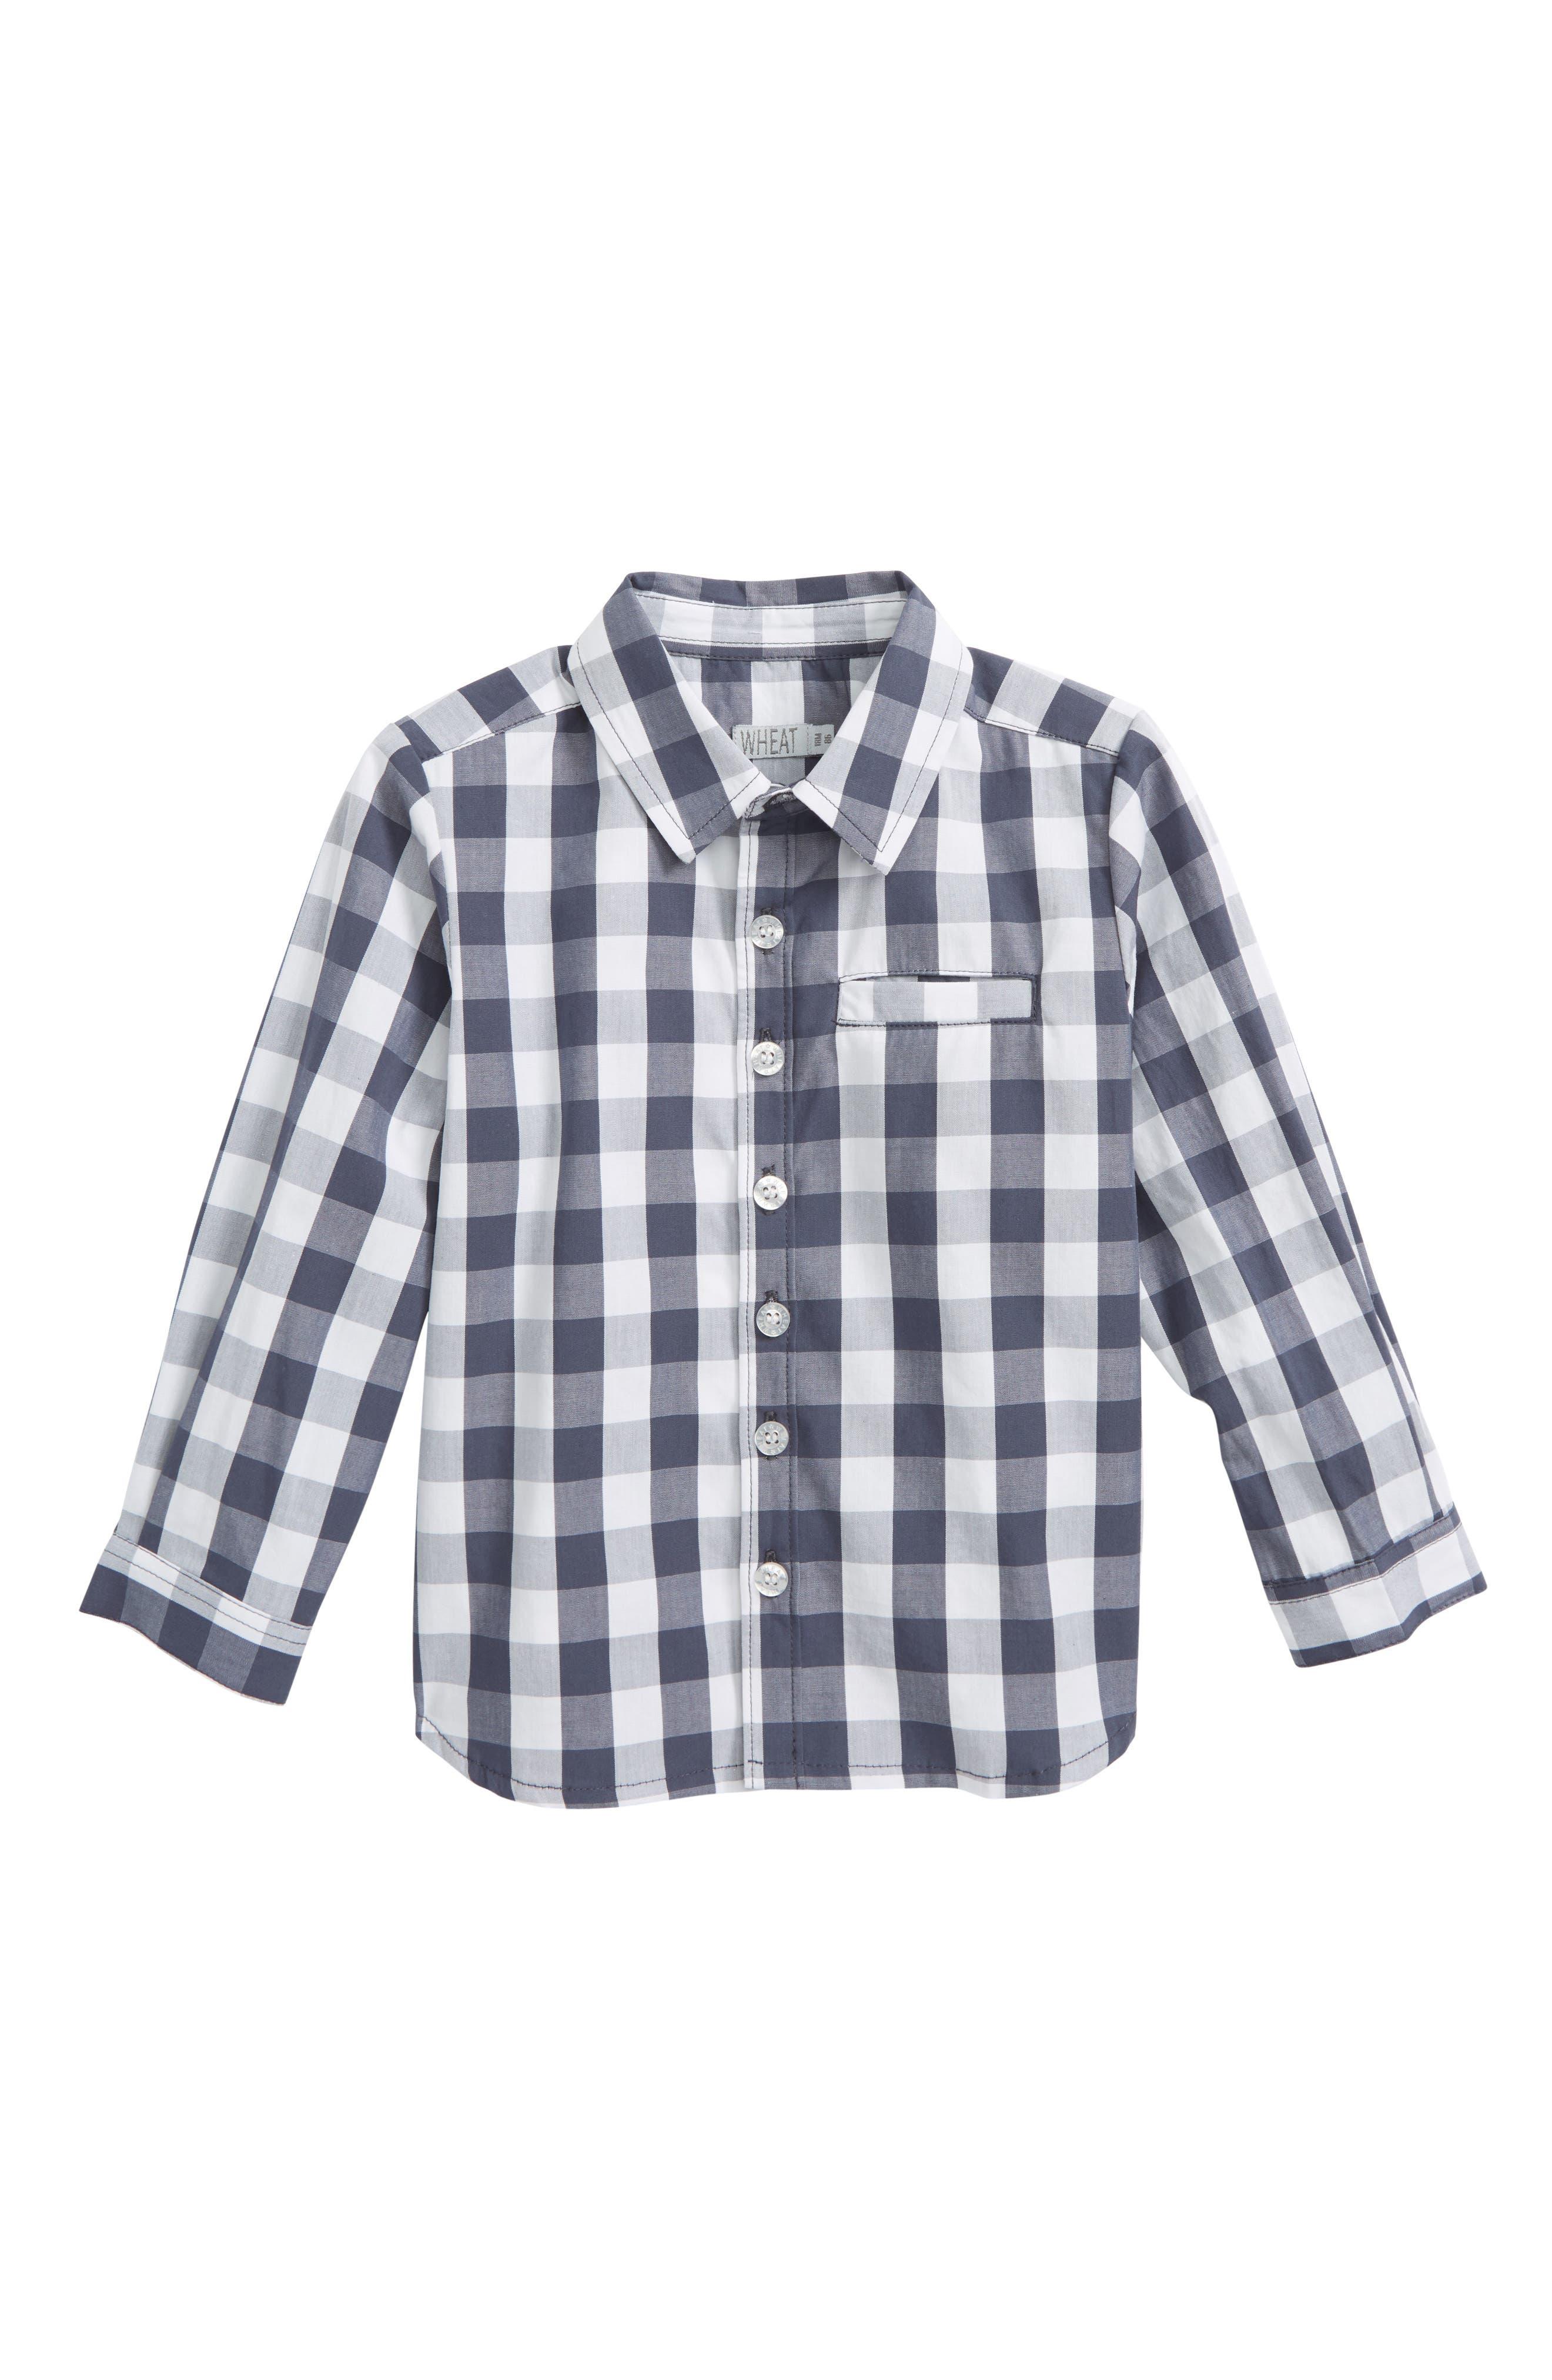 Alternate Image 1 Selected - Wheat Ellias Check Shirt (Baby Boys & Toddler Boys)